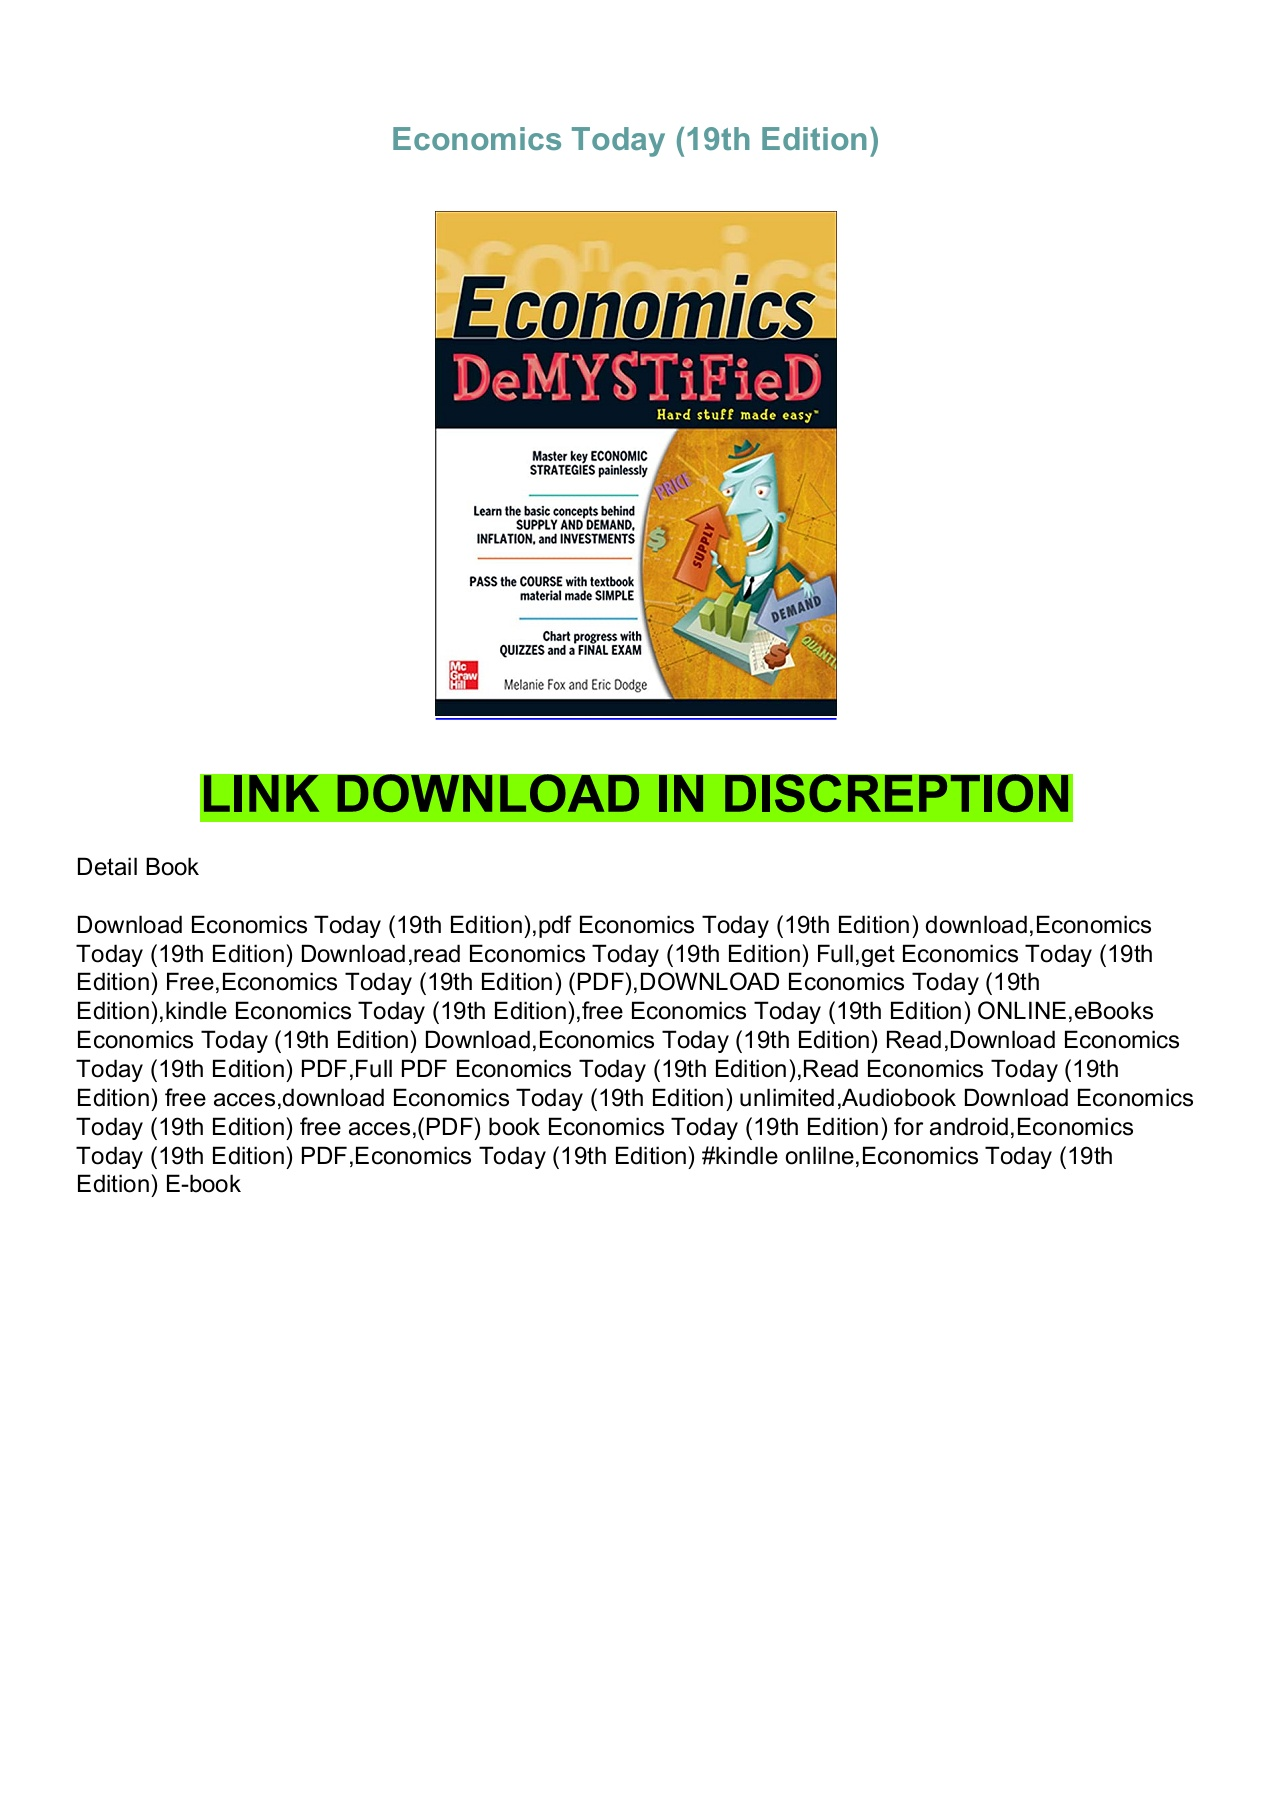 Economics Today 19th Edition Pdf